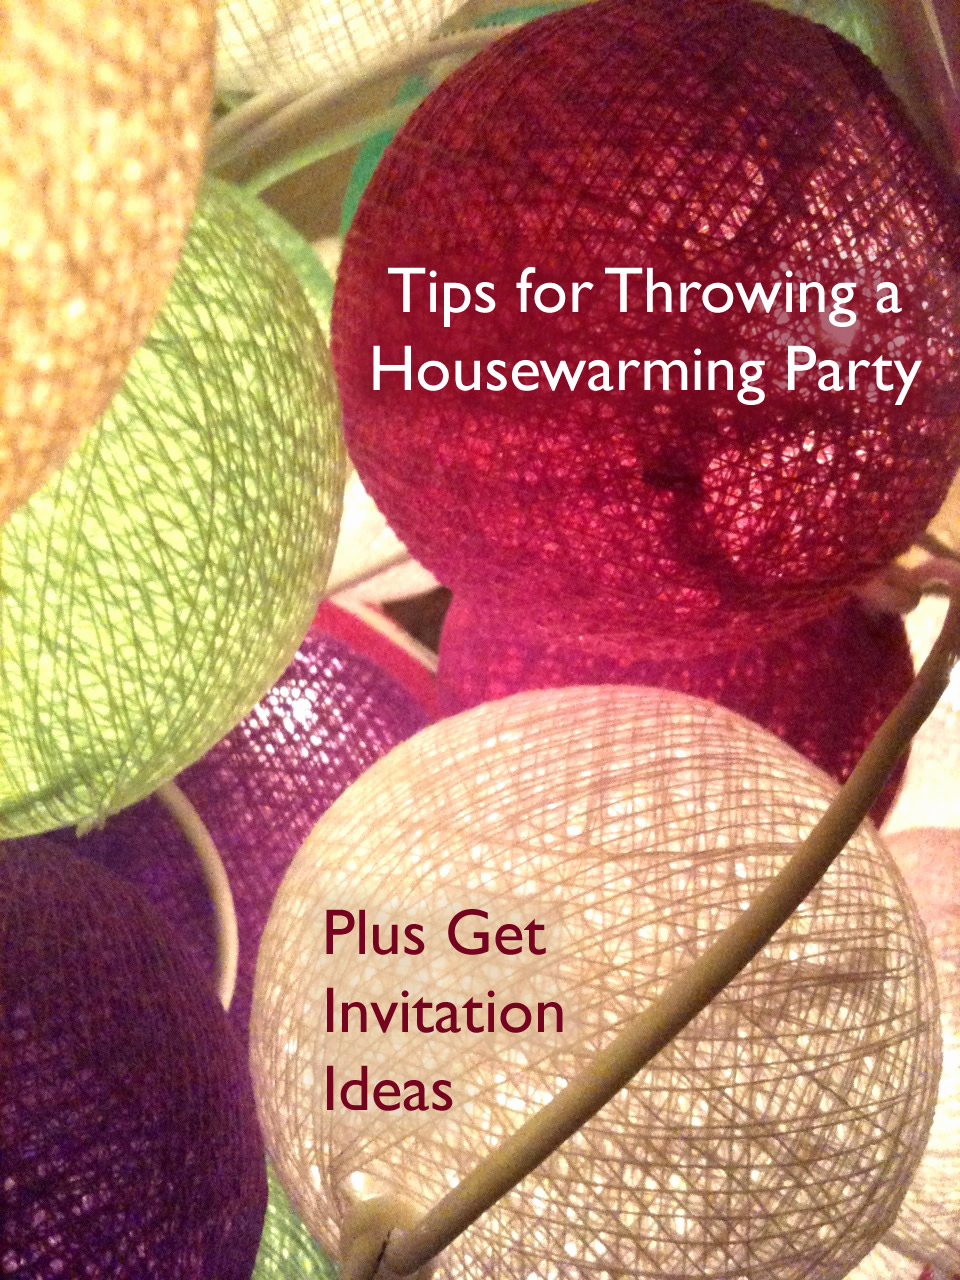 House Warming Invitation Ideas Beautiful Tips for Throwing A Housewarming Party Invitation Ideas